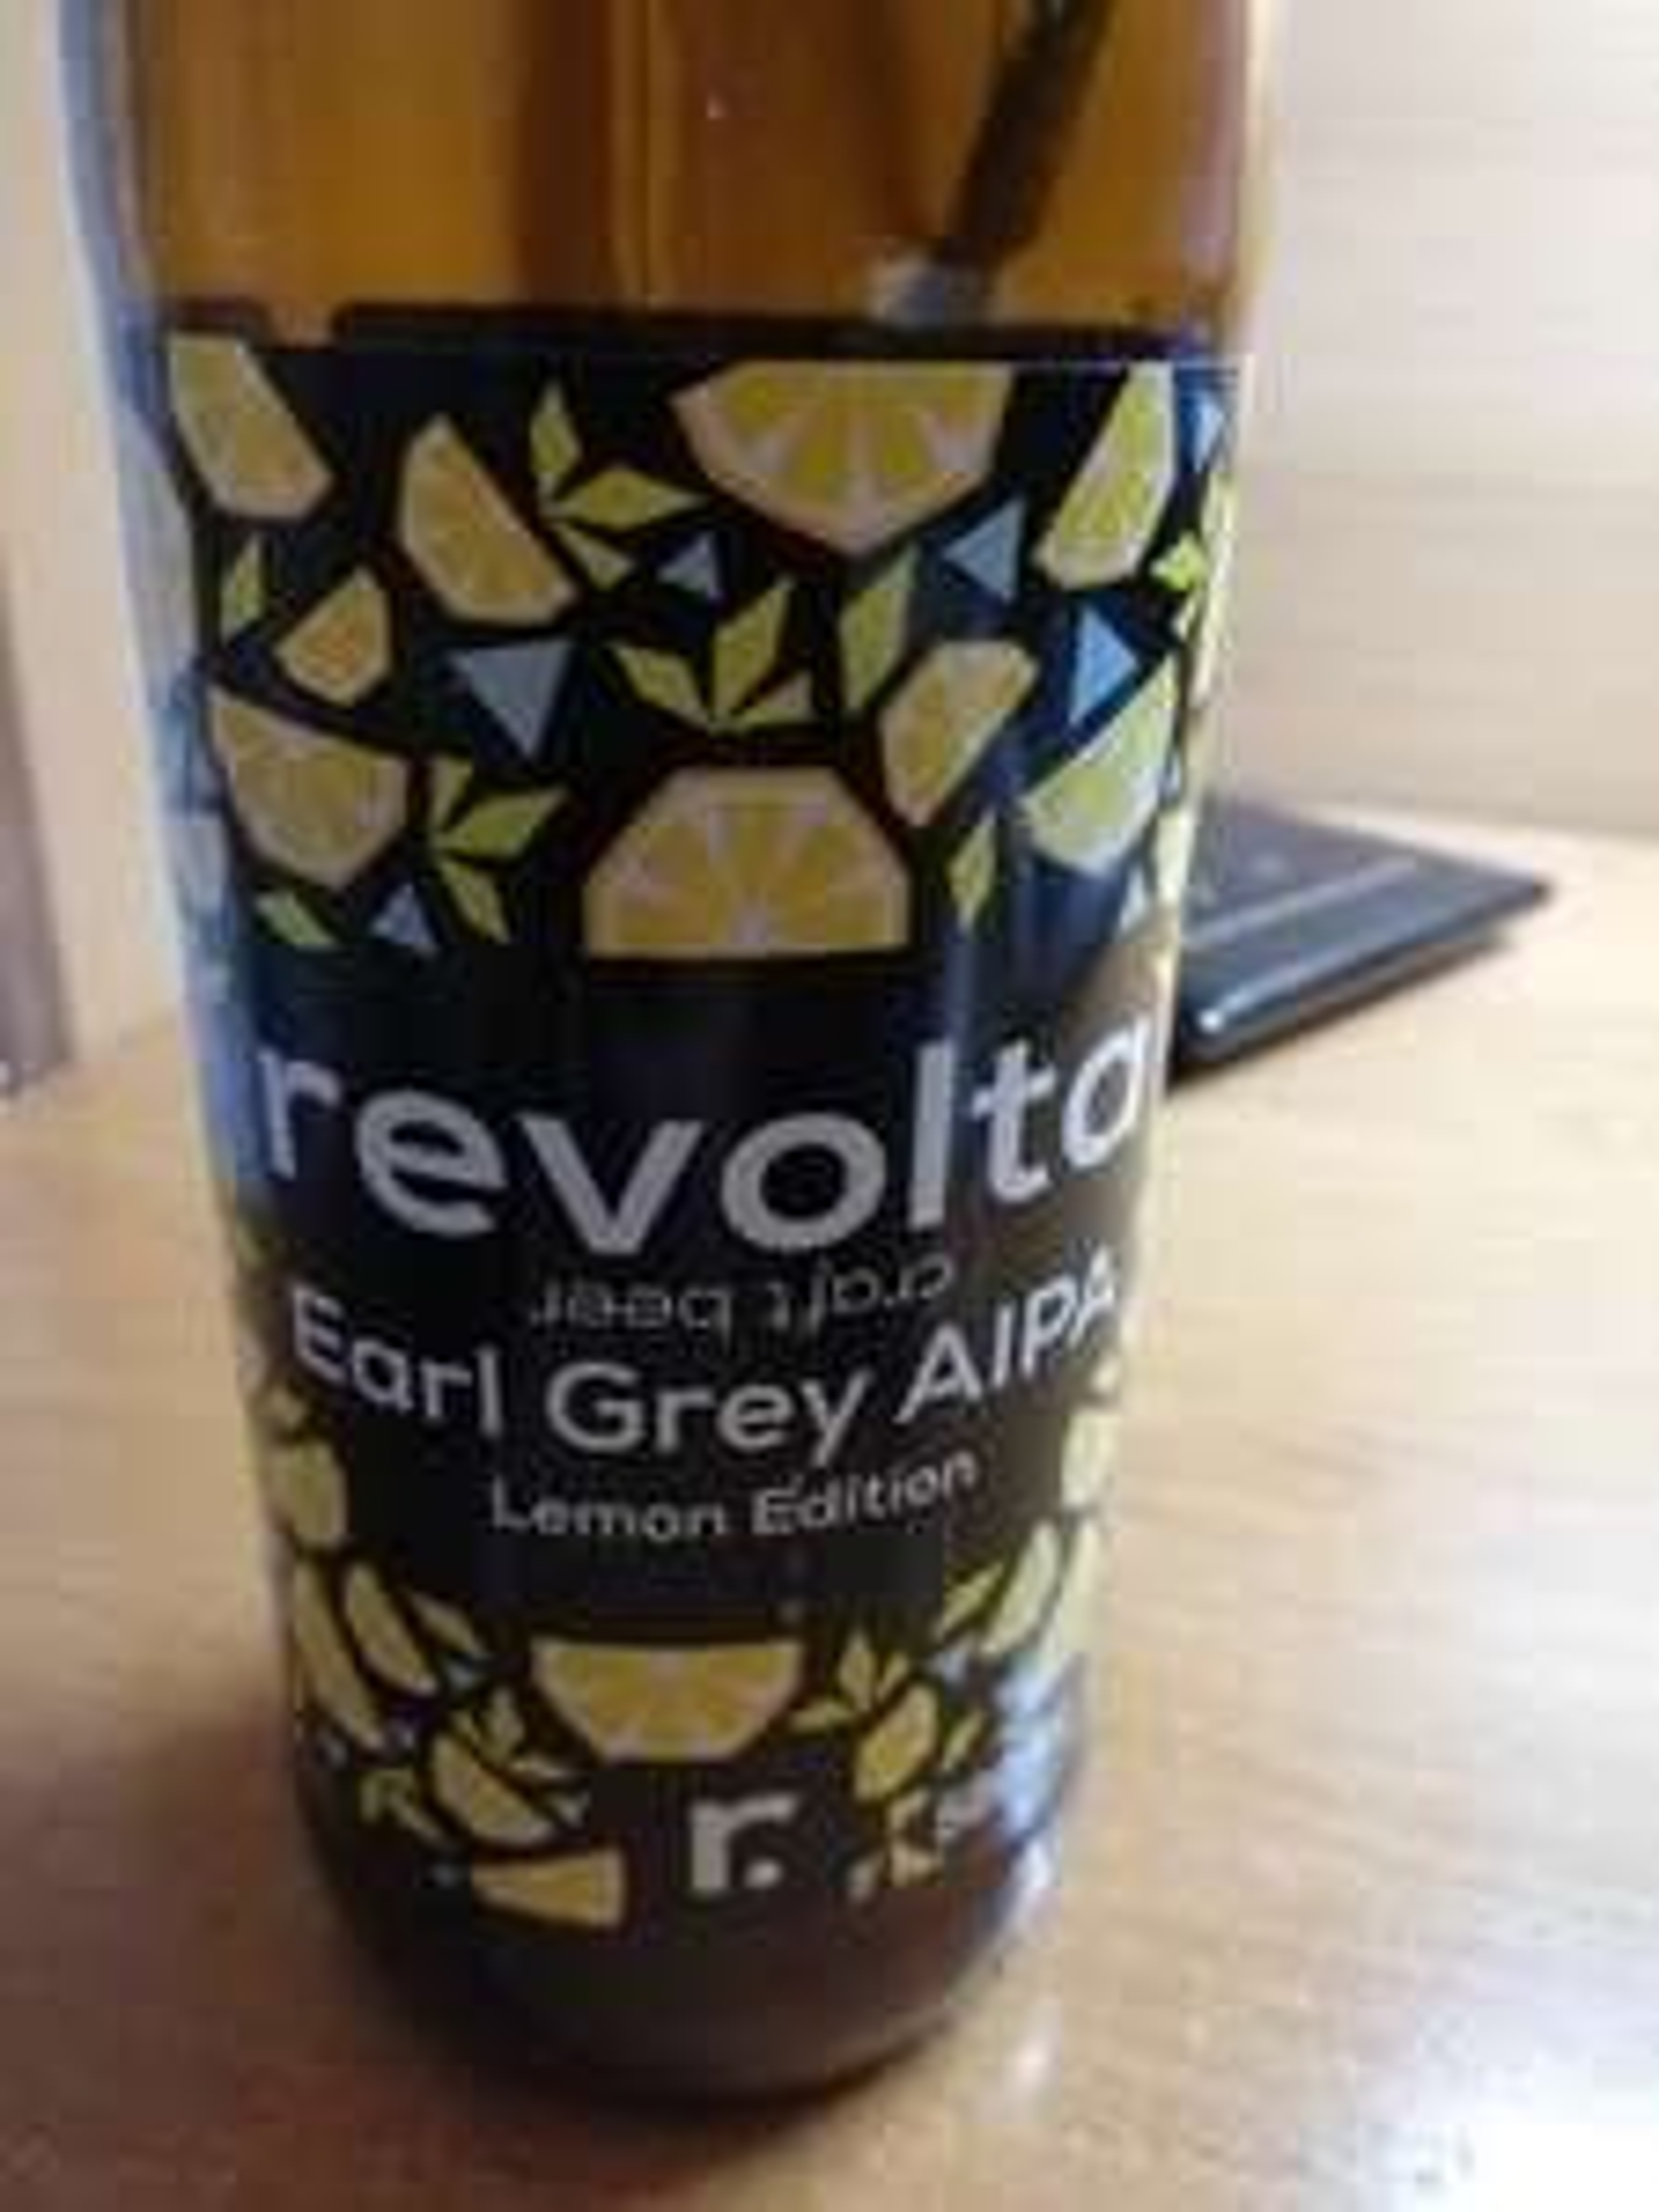 Piwo Revolta Earl Grey Aipa Lemon Lidl